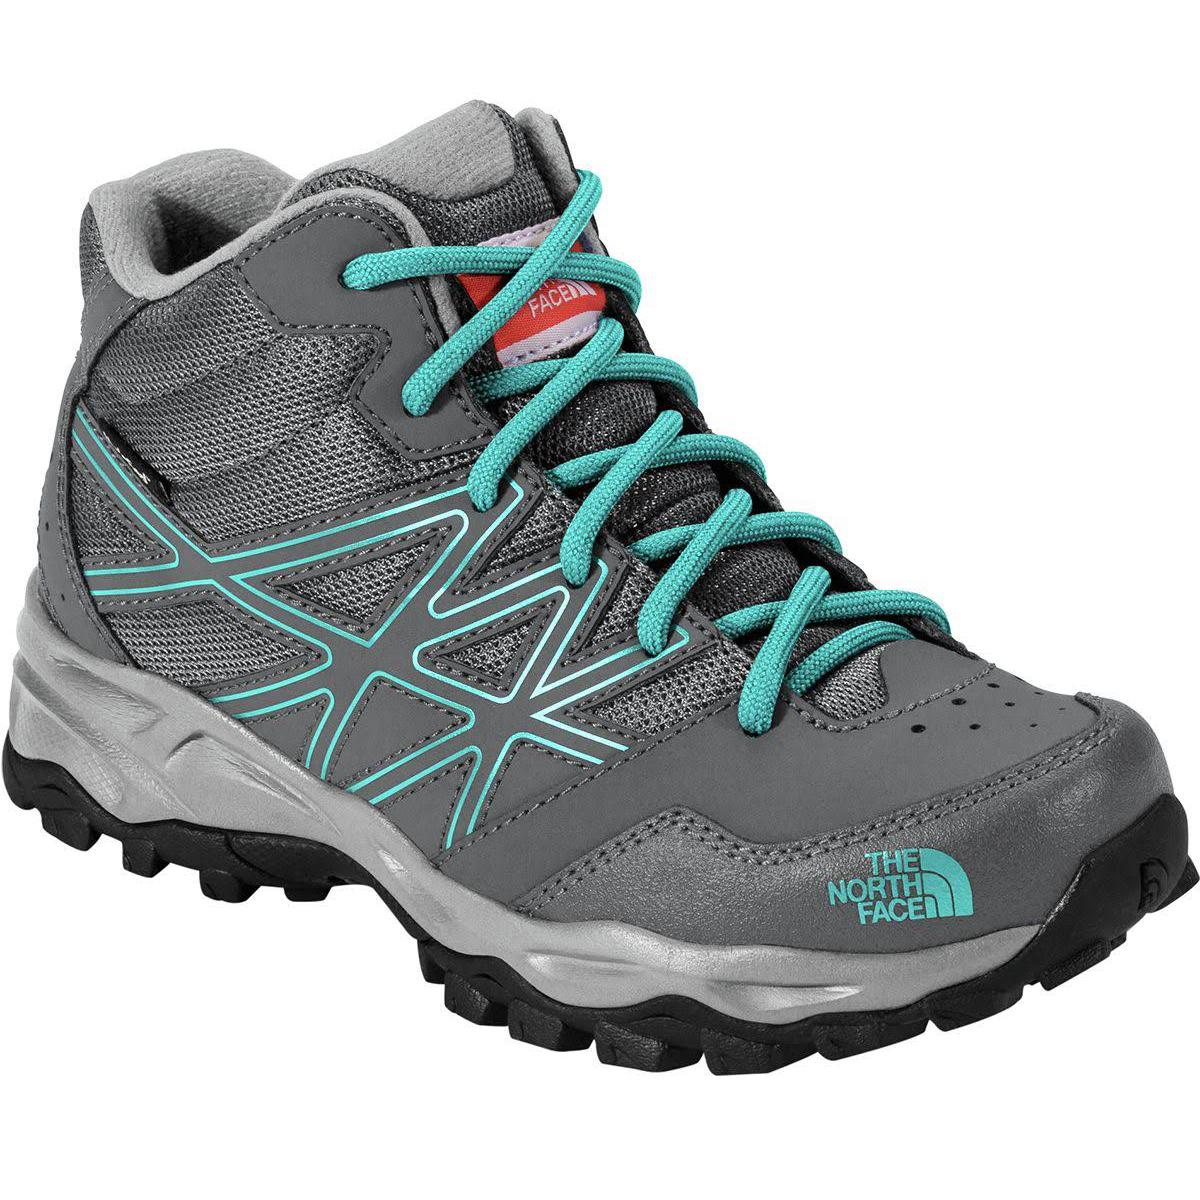 The North Face Kids' Jr Hedgehog Hiker Mid Waterproof Hiking Boots - Black, 2.5